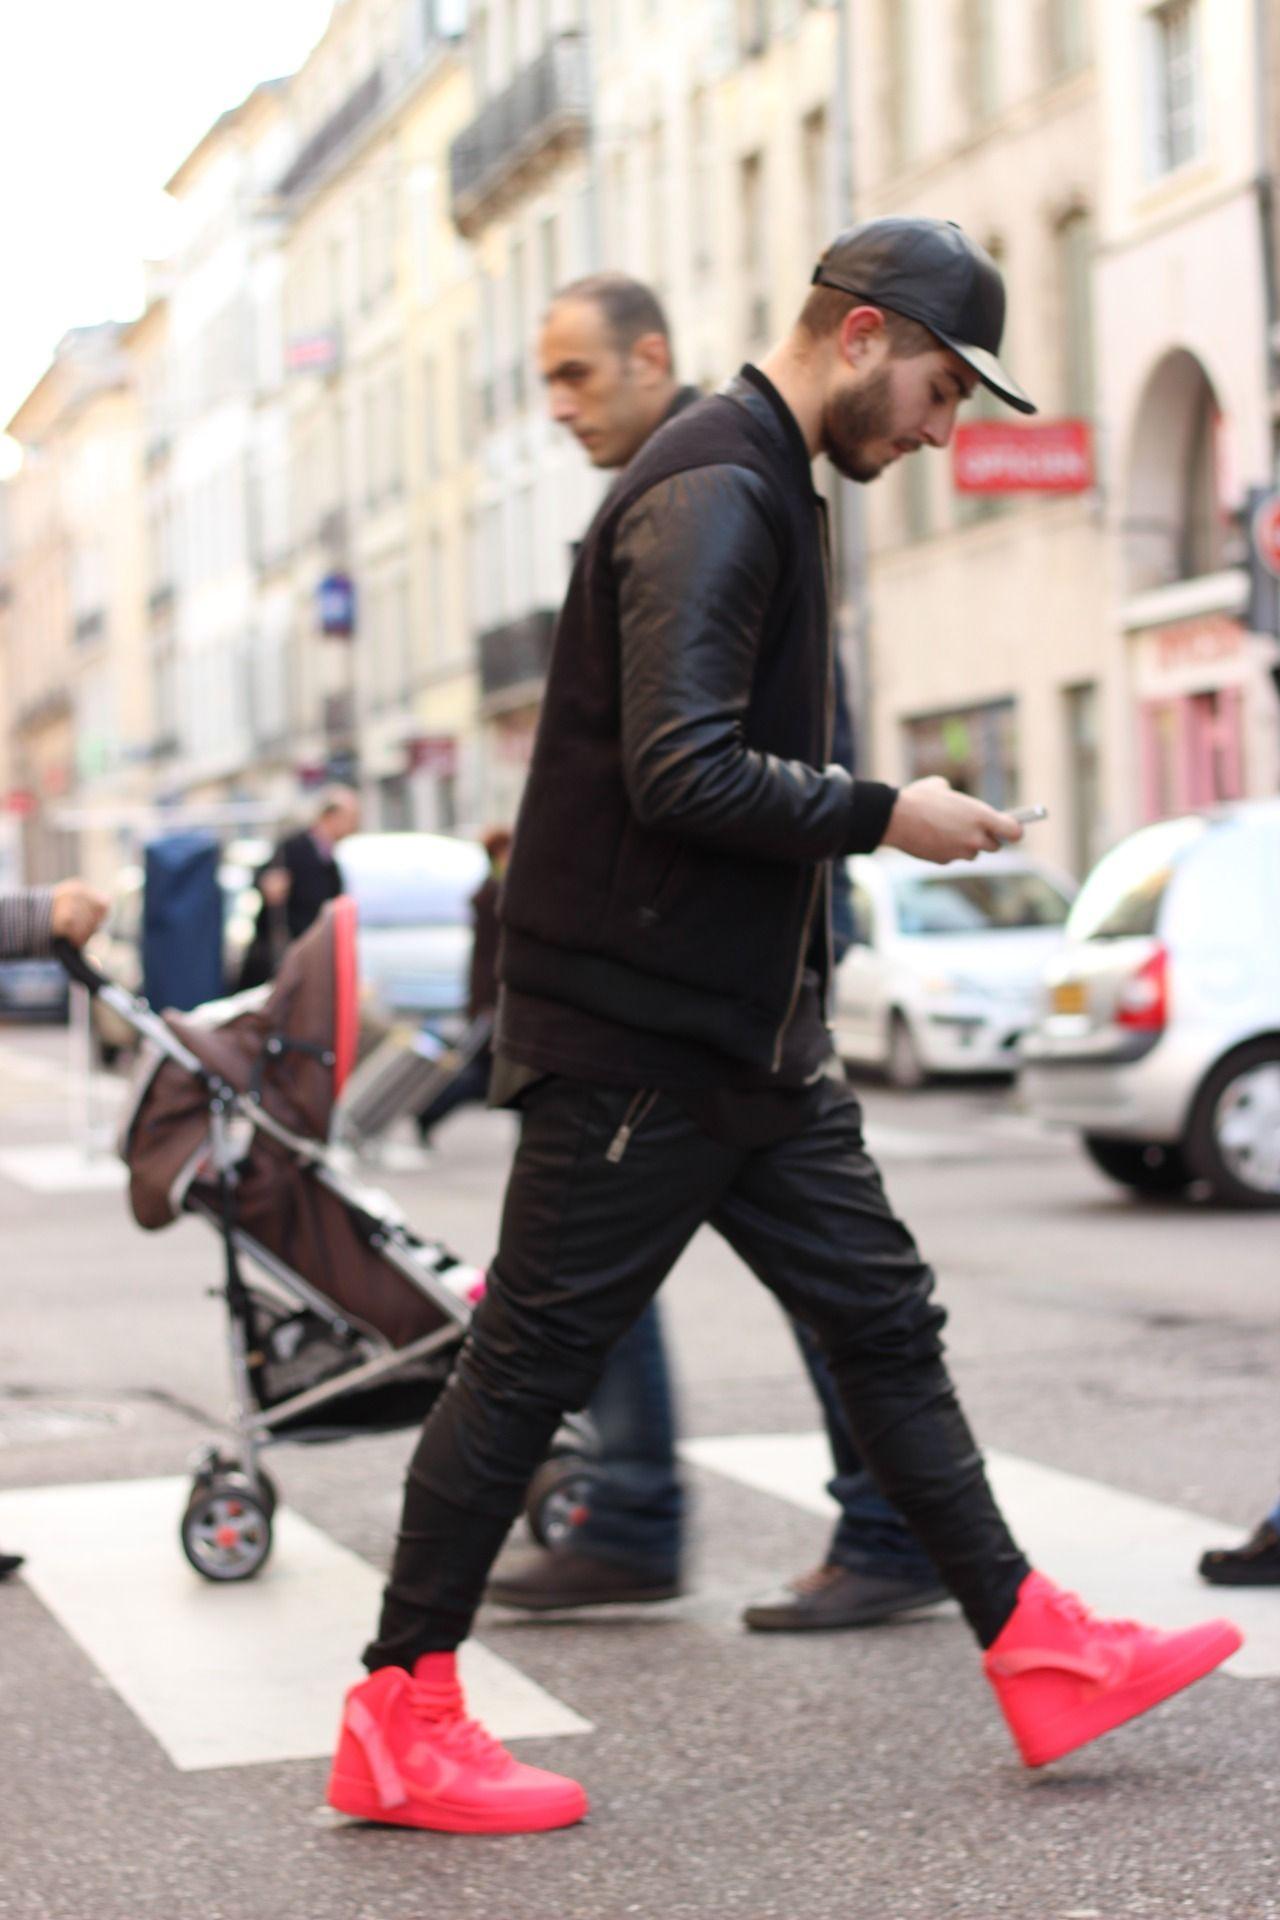 Street & Luxury at BLVCKZOID ALLEYN Confident dude